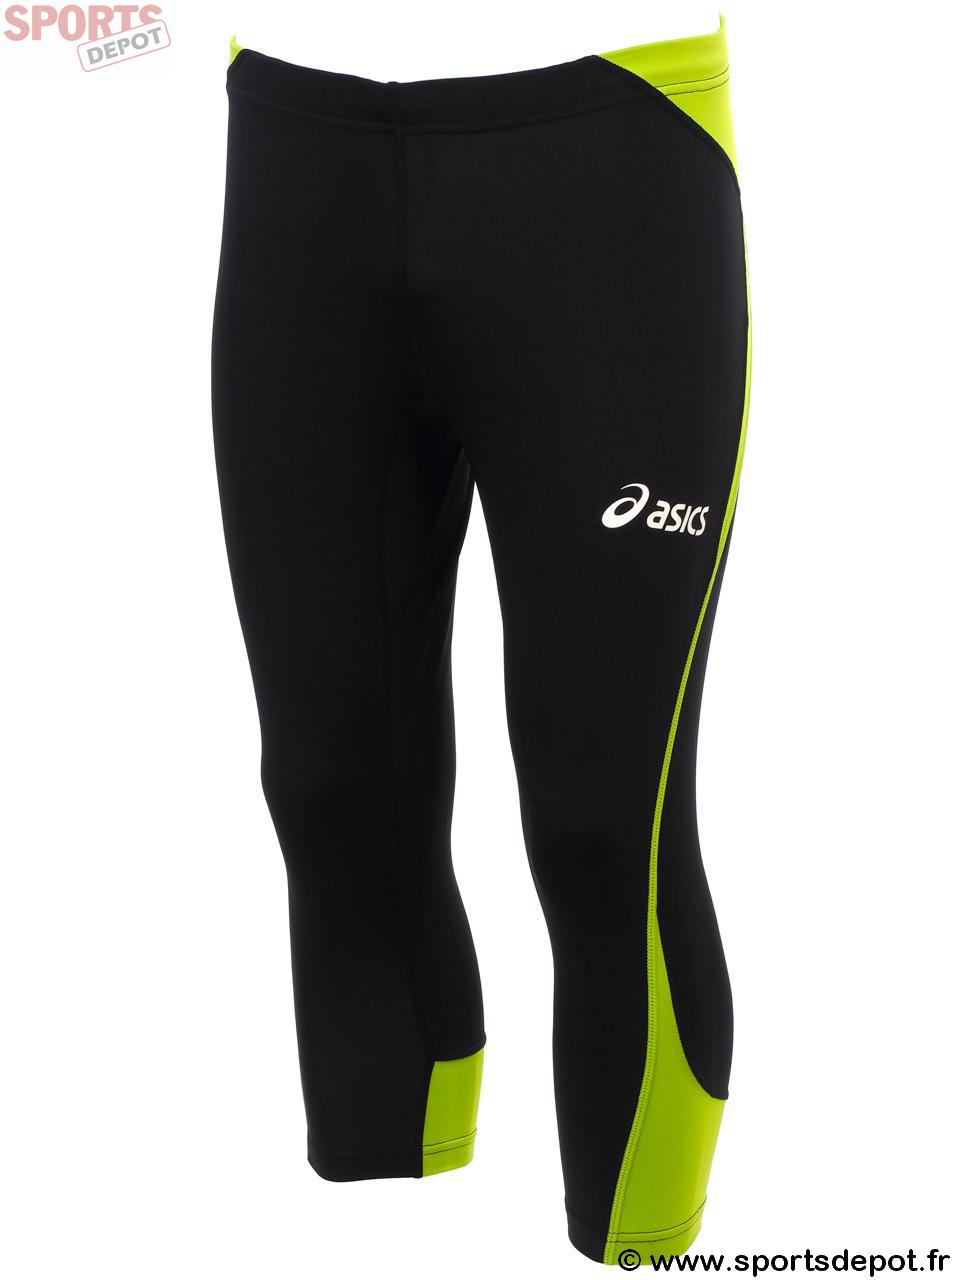 pantalon running asics homme off 66% - bonyadroudaki.com